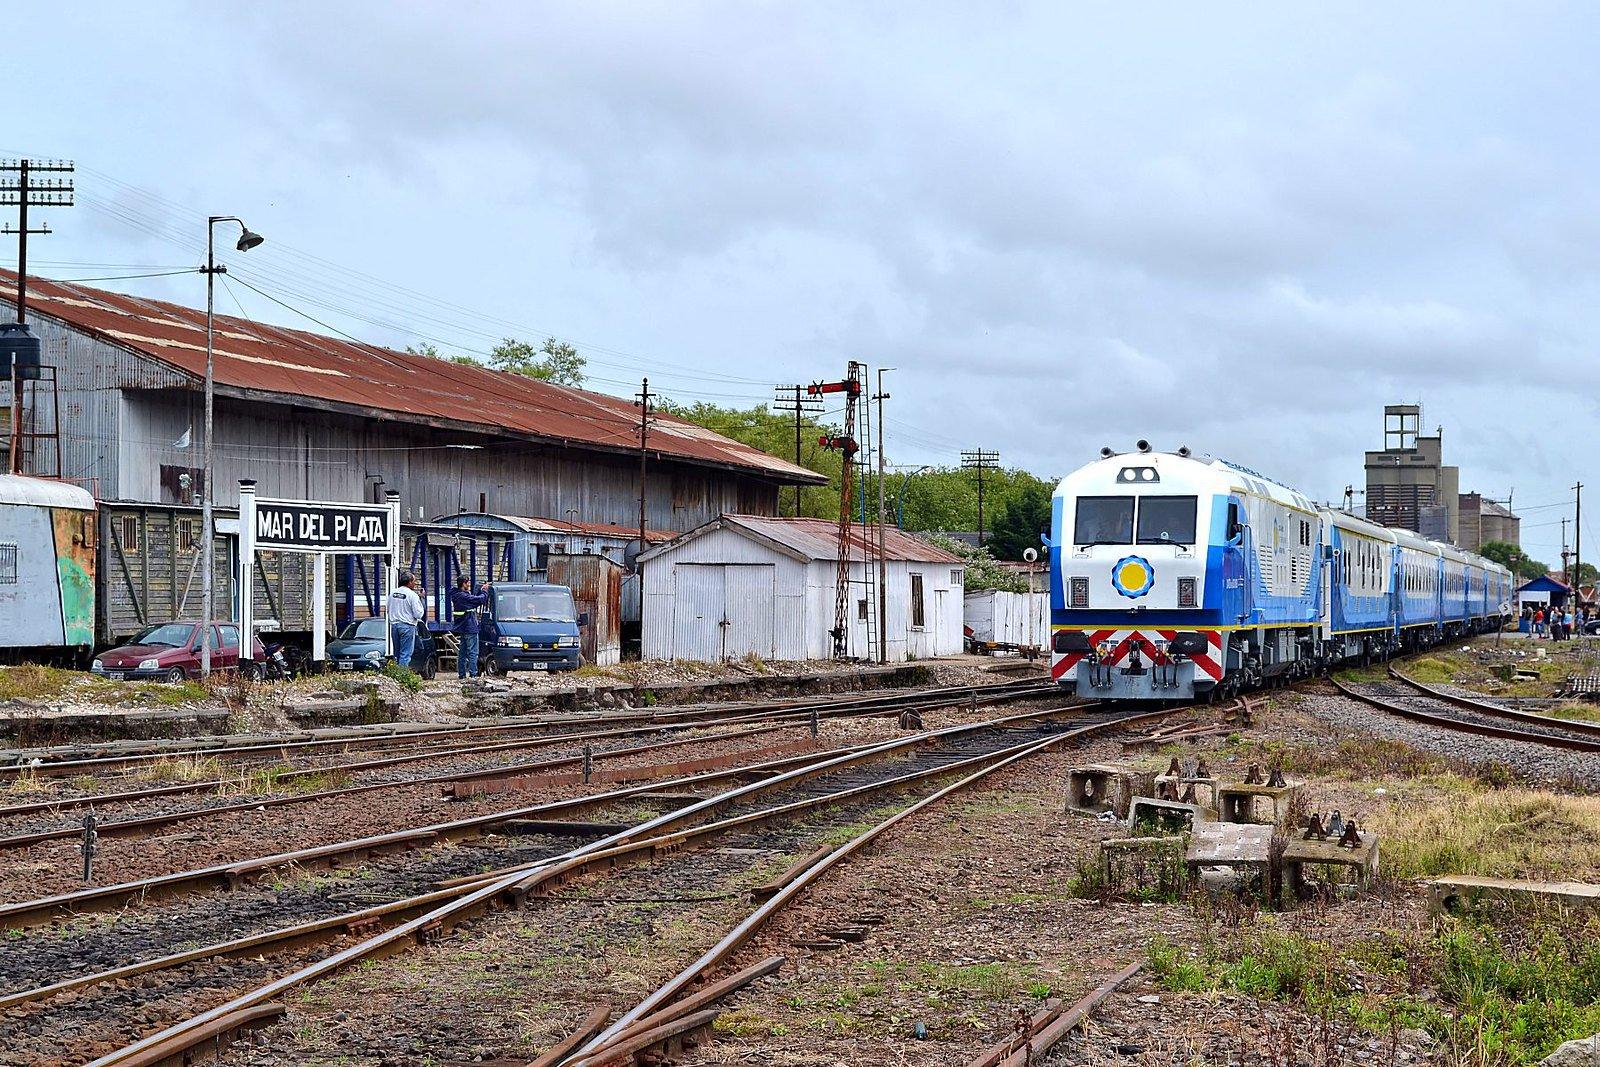 A Chinese-built train (CNR CKD8) passes through Mar del Plata, Argentina. Photo credit: Juan Enrique Gilardi CC BY-SA 2.0